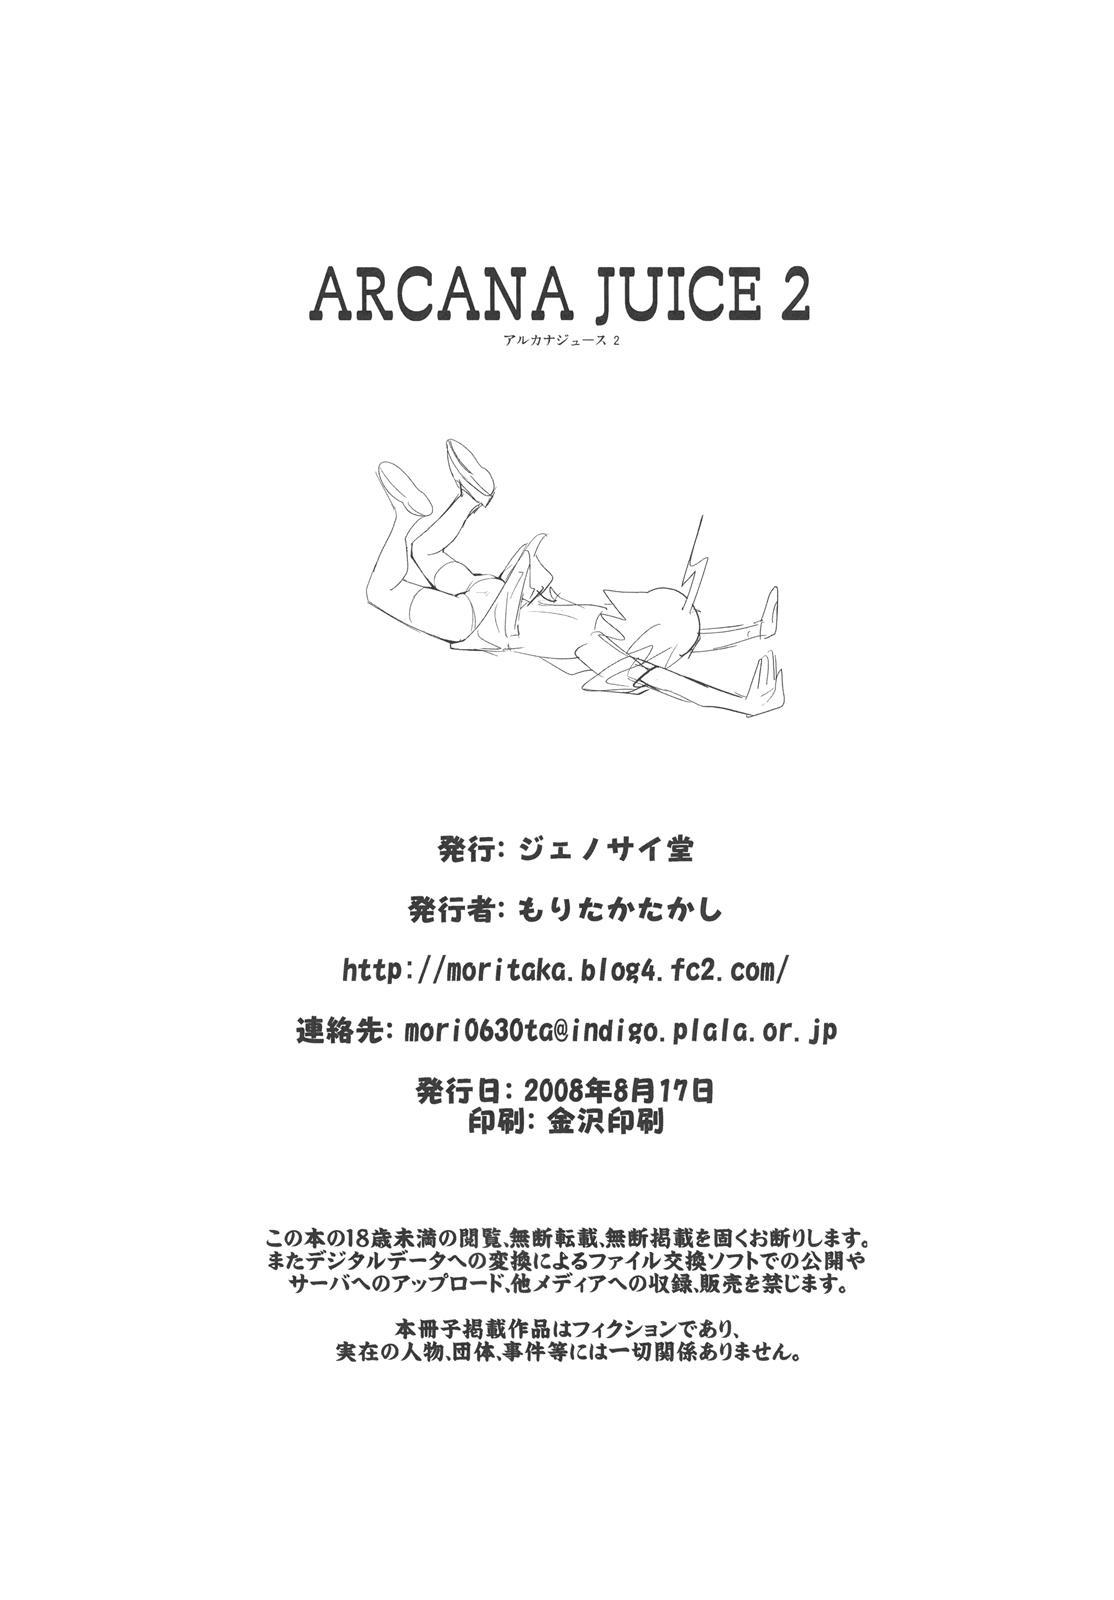 ARCANA JUICE 2 32